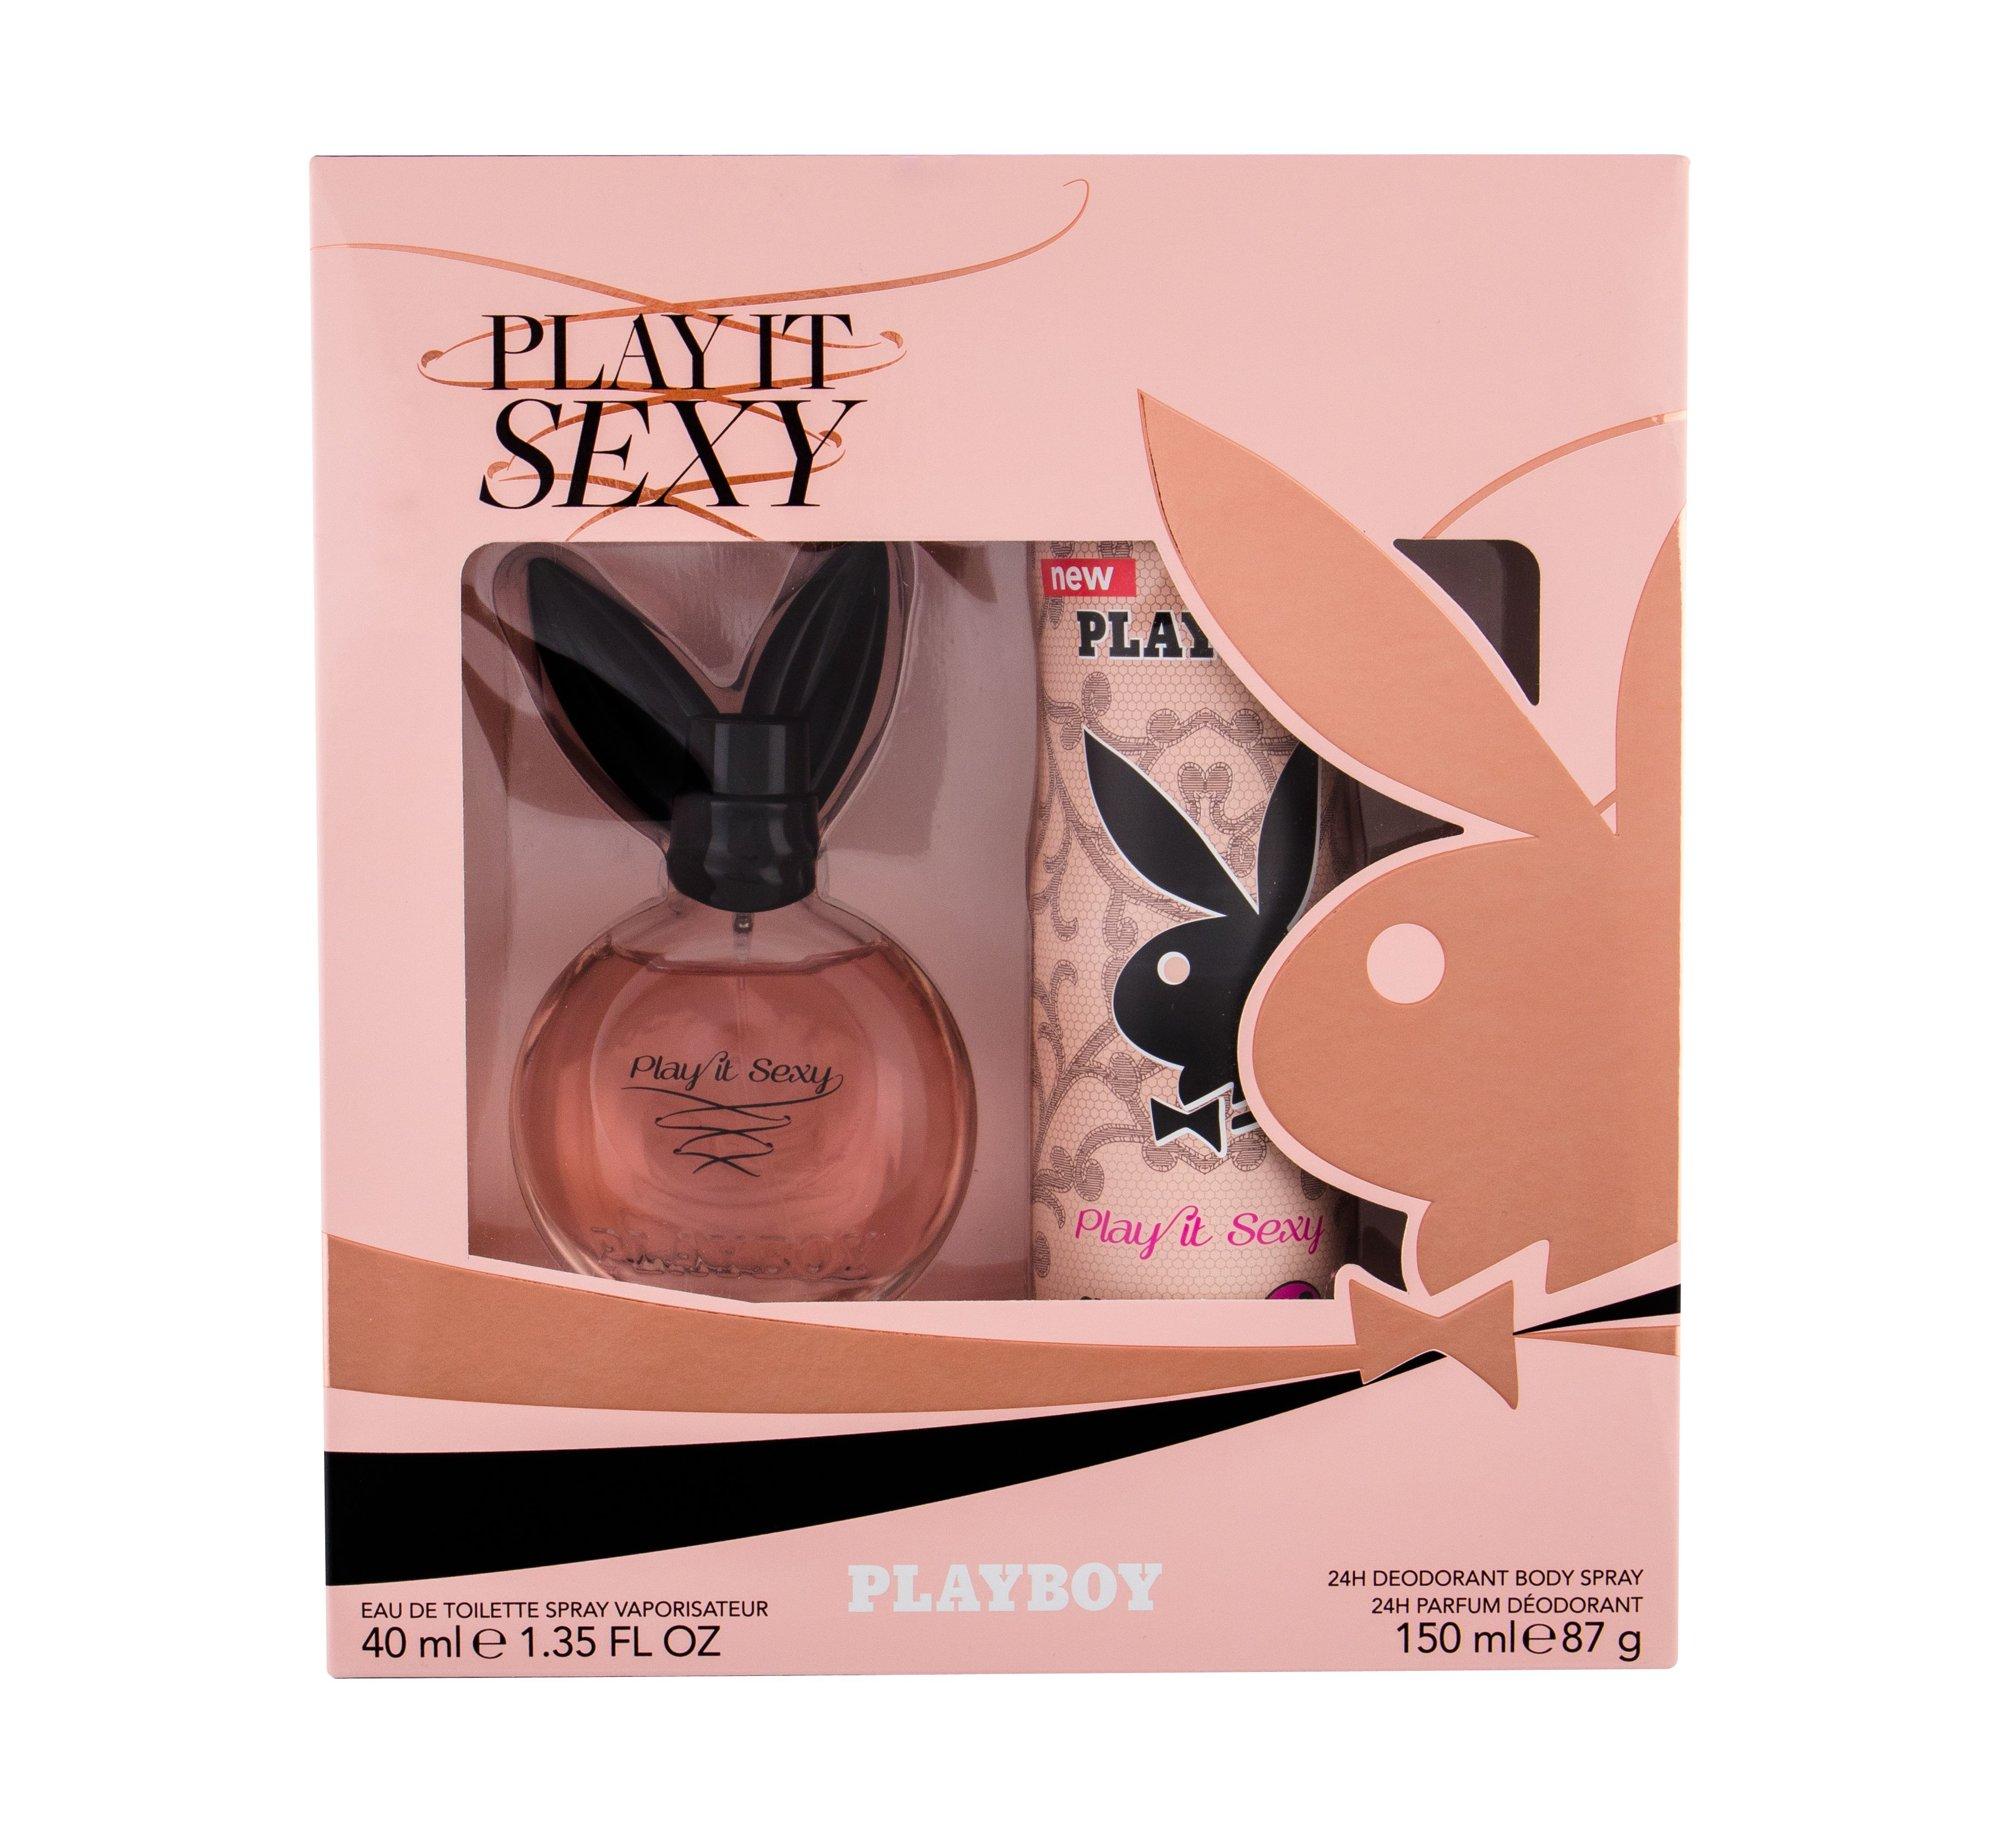 Playboy Play It Sexy For Her Eau de Toilette 40ml